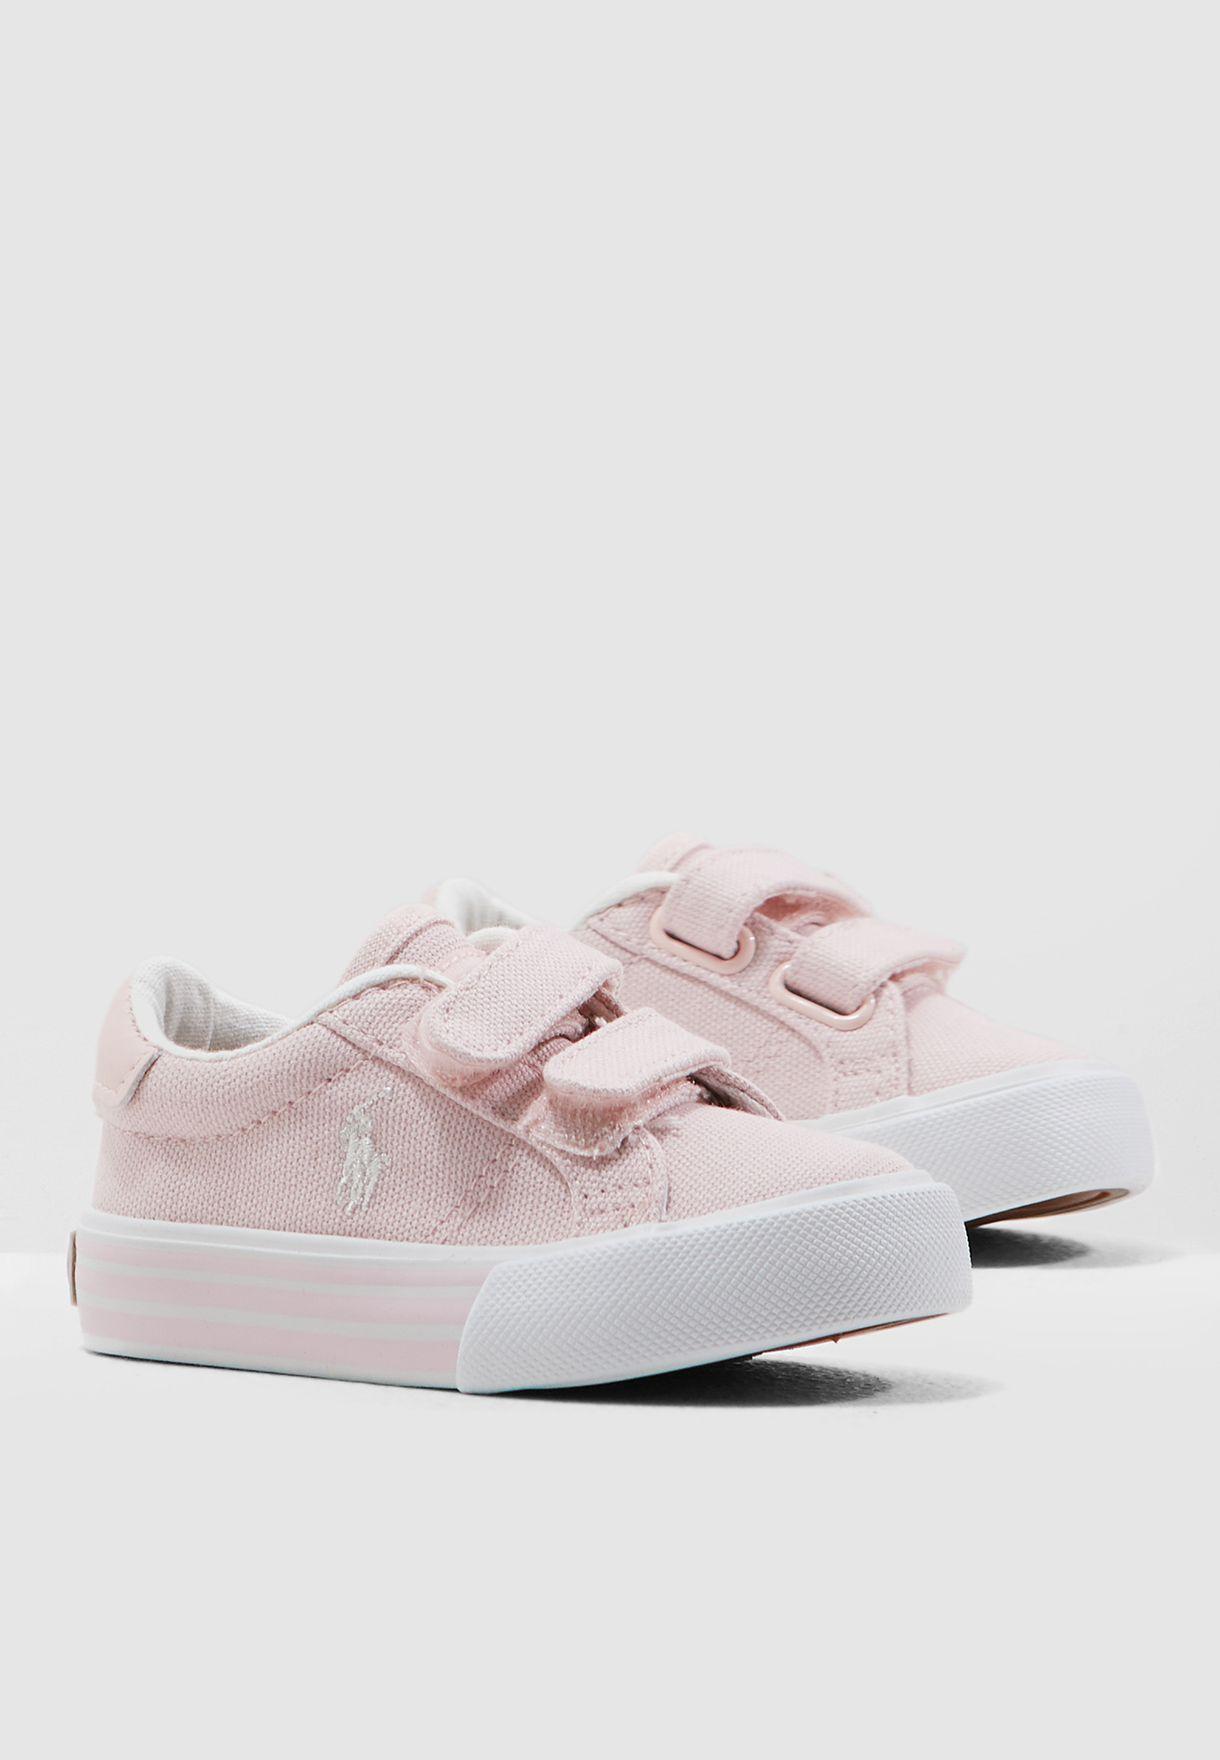 a2b6e2c47 Shop Polo Ralph Lauren pink Infant Edgewood Ez Sneaker RF101562 for ...